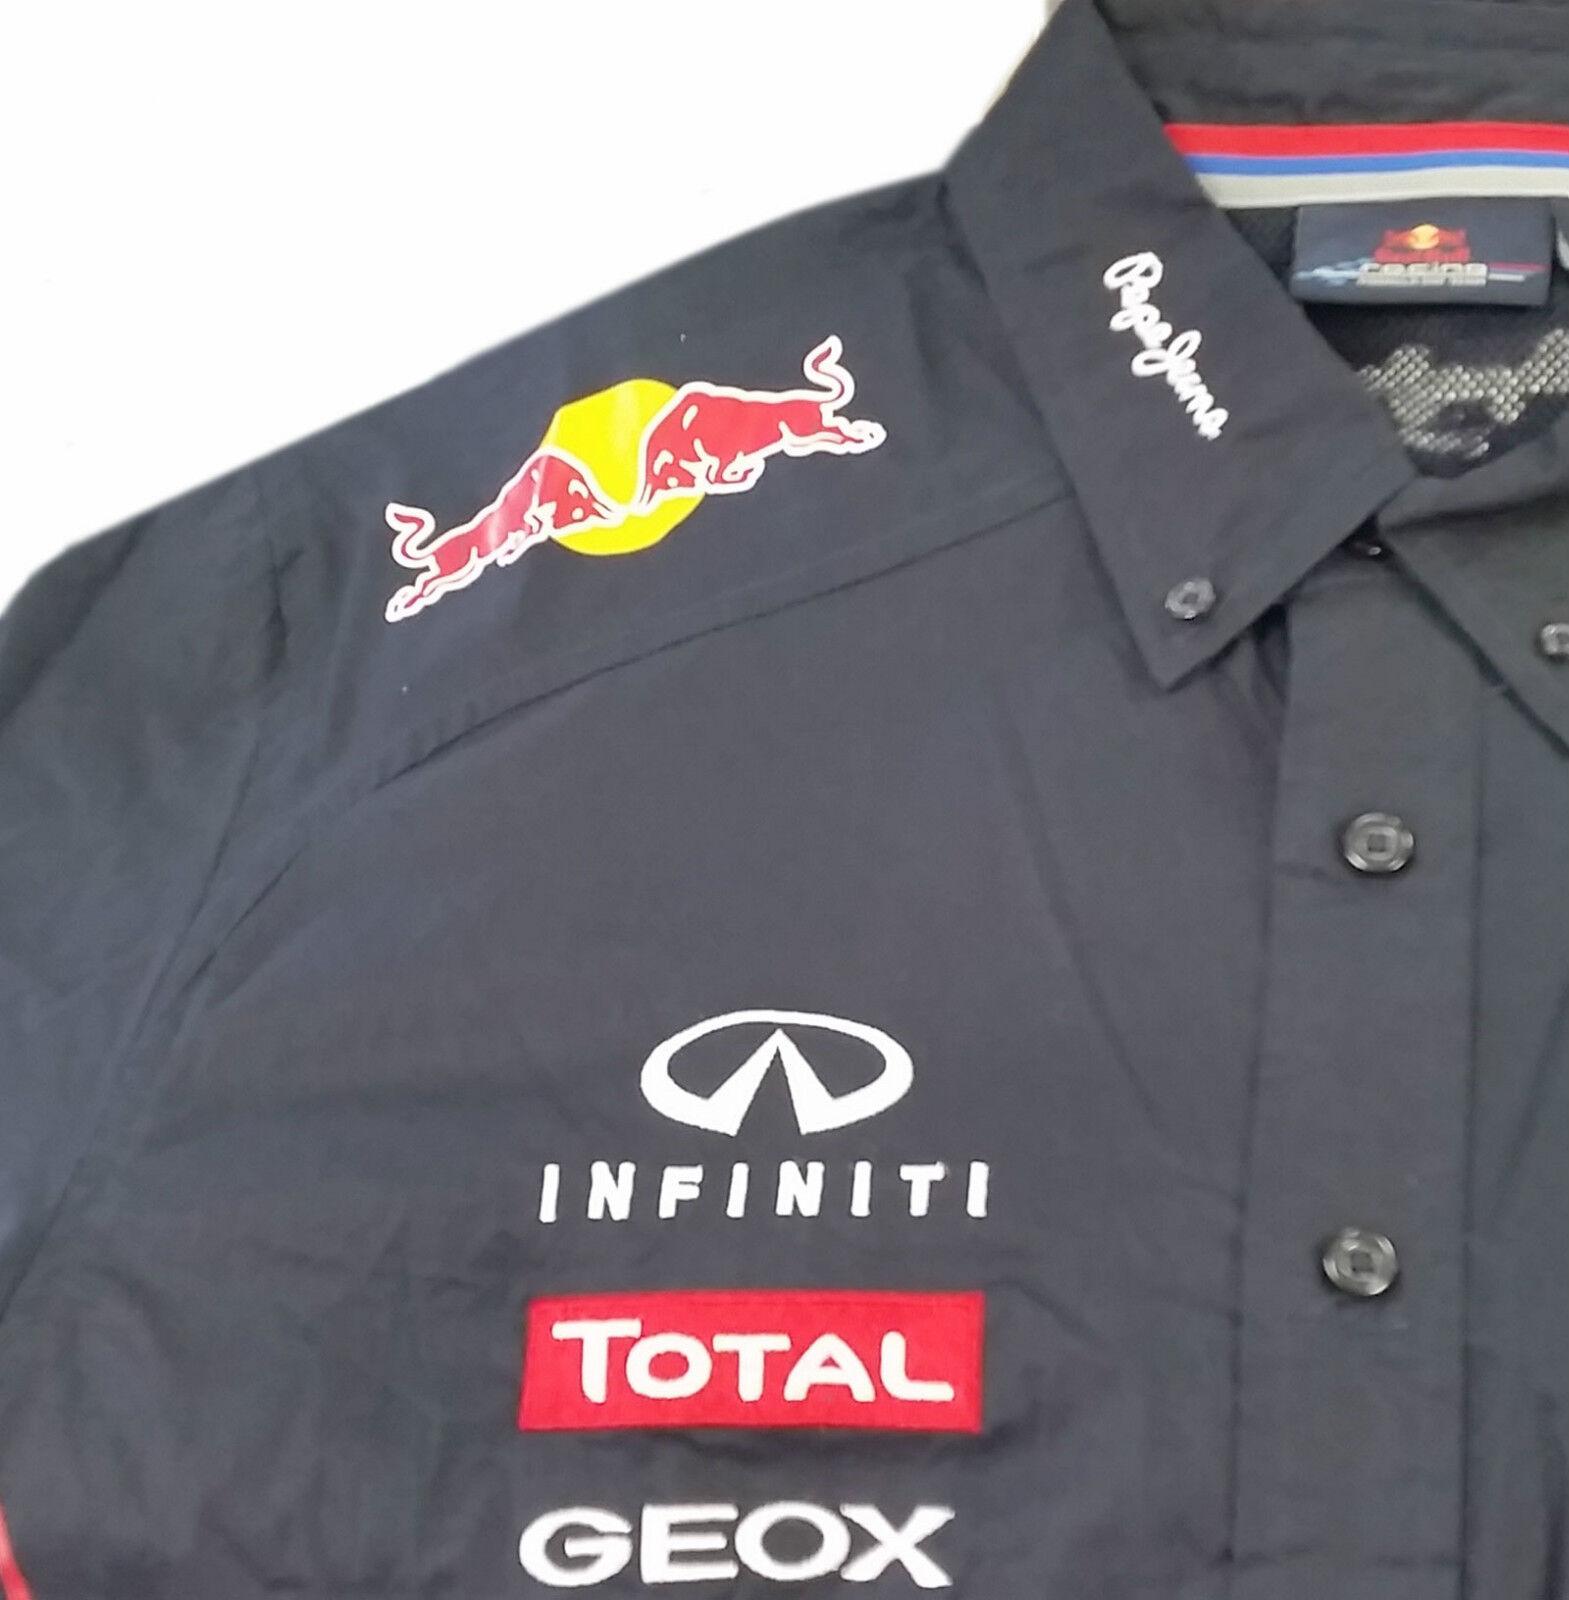 AUTHENTIC INFINITI RED BULL F1 RACING TEAM 2012 MENS SHIRT FULL SPONSORS VETTEL